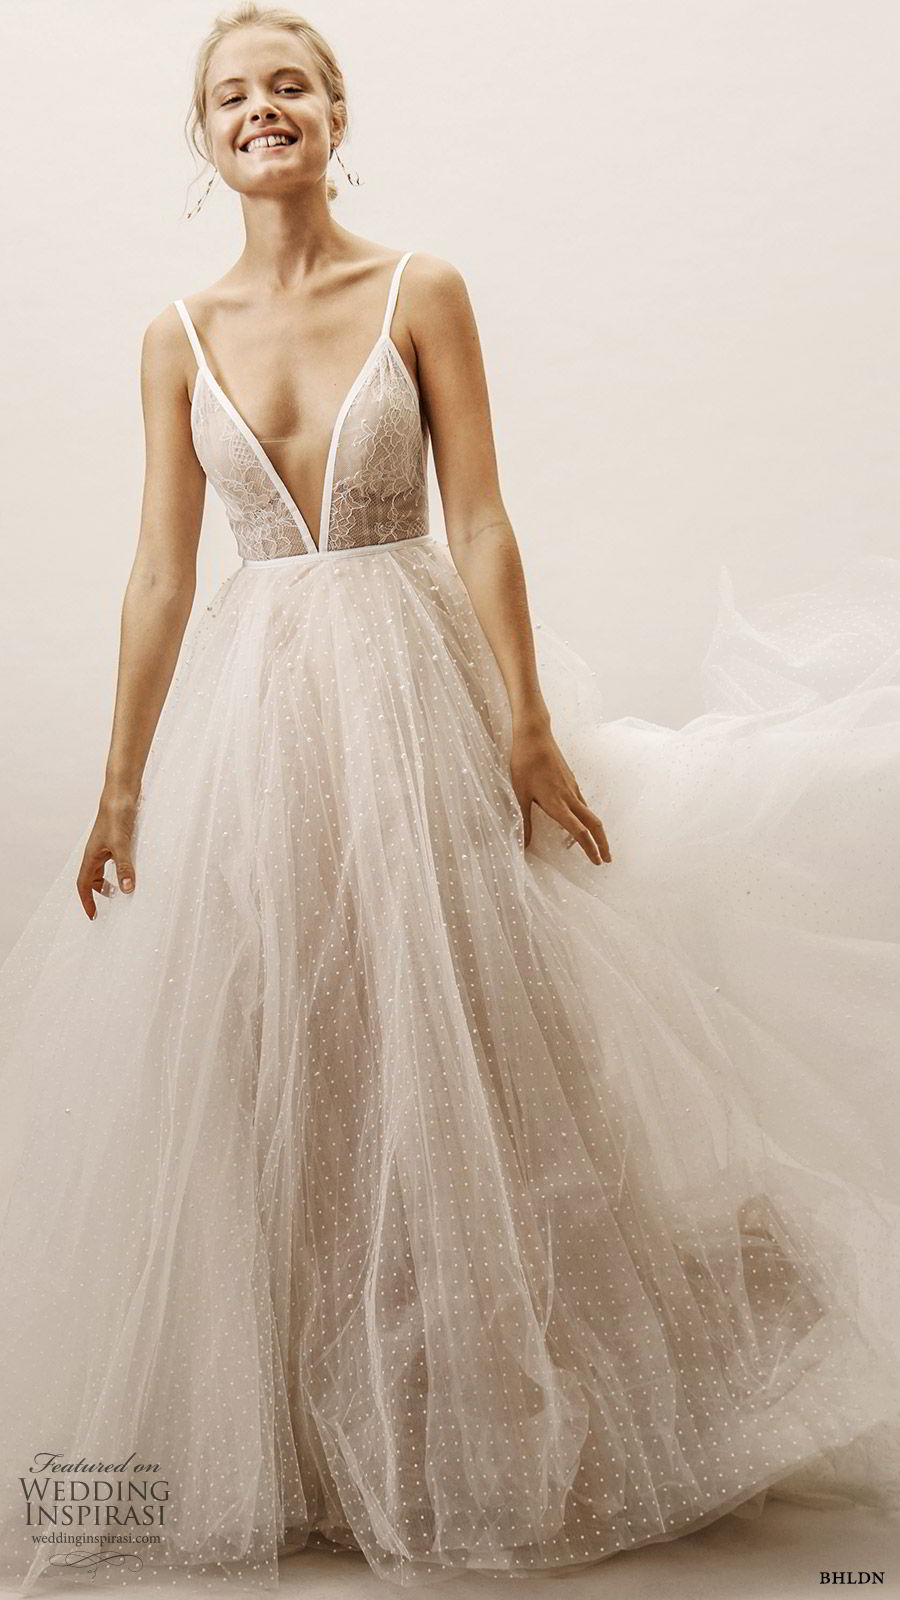 bhldn spring 2019 bridal sleeveless straps deep v neckline embellished bodice a line ball gown wedding dress romantic elegant (1) mv